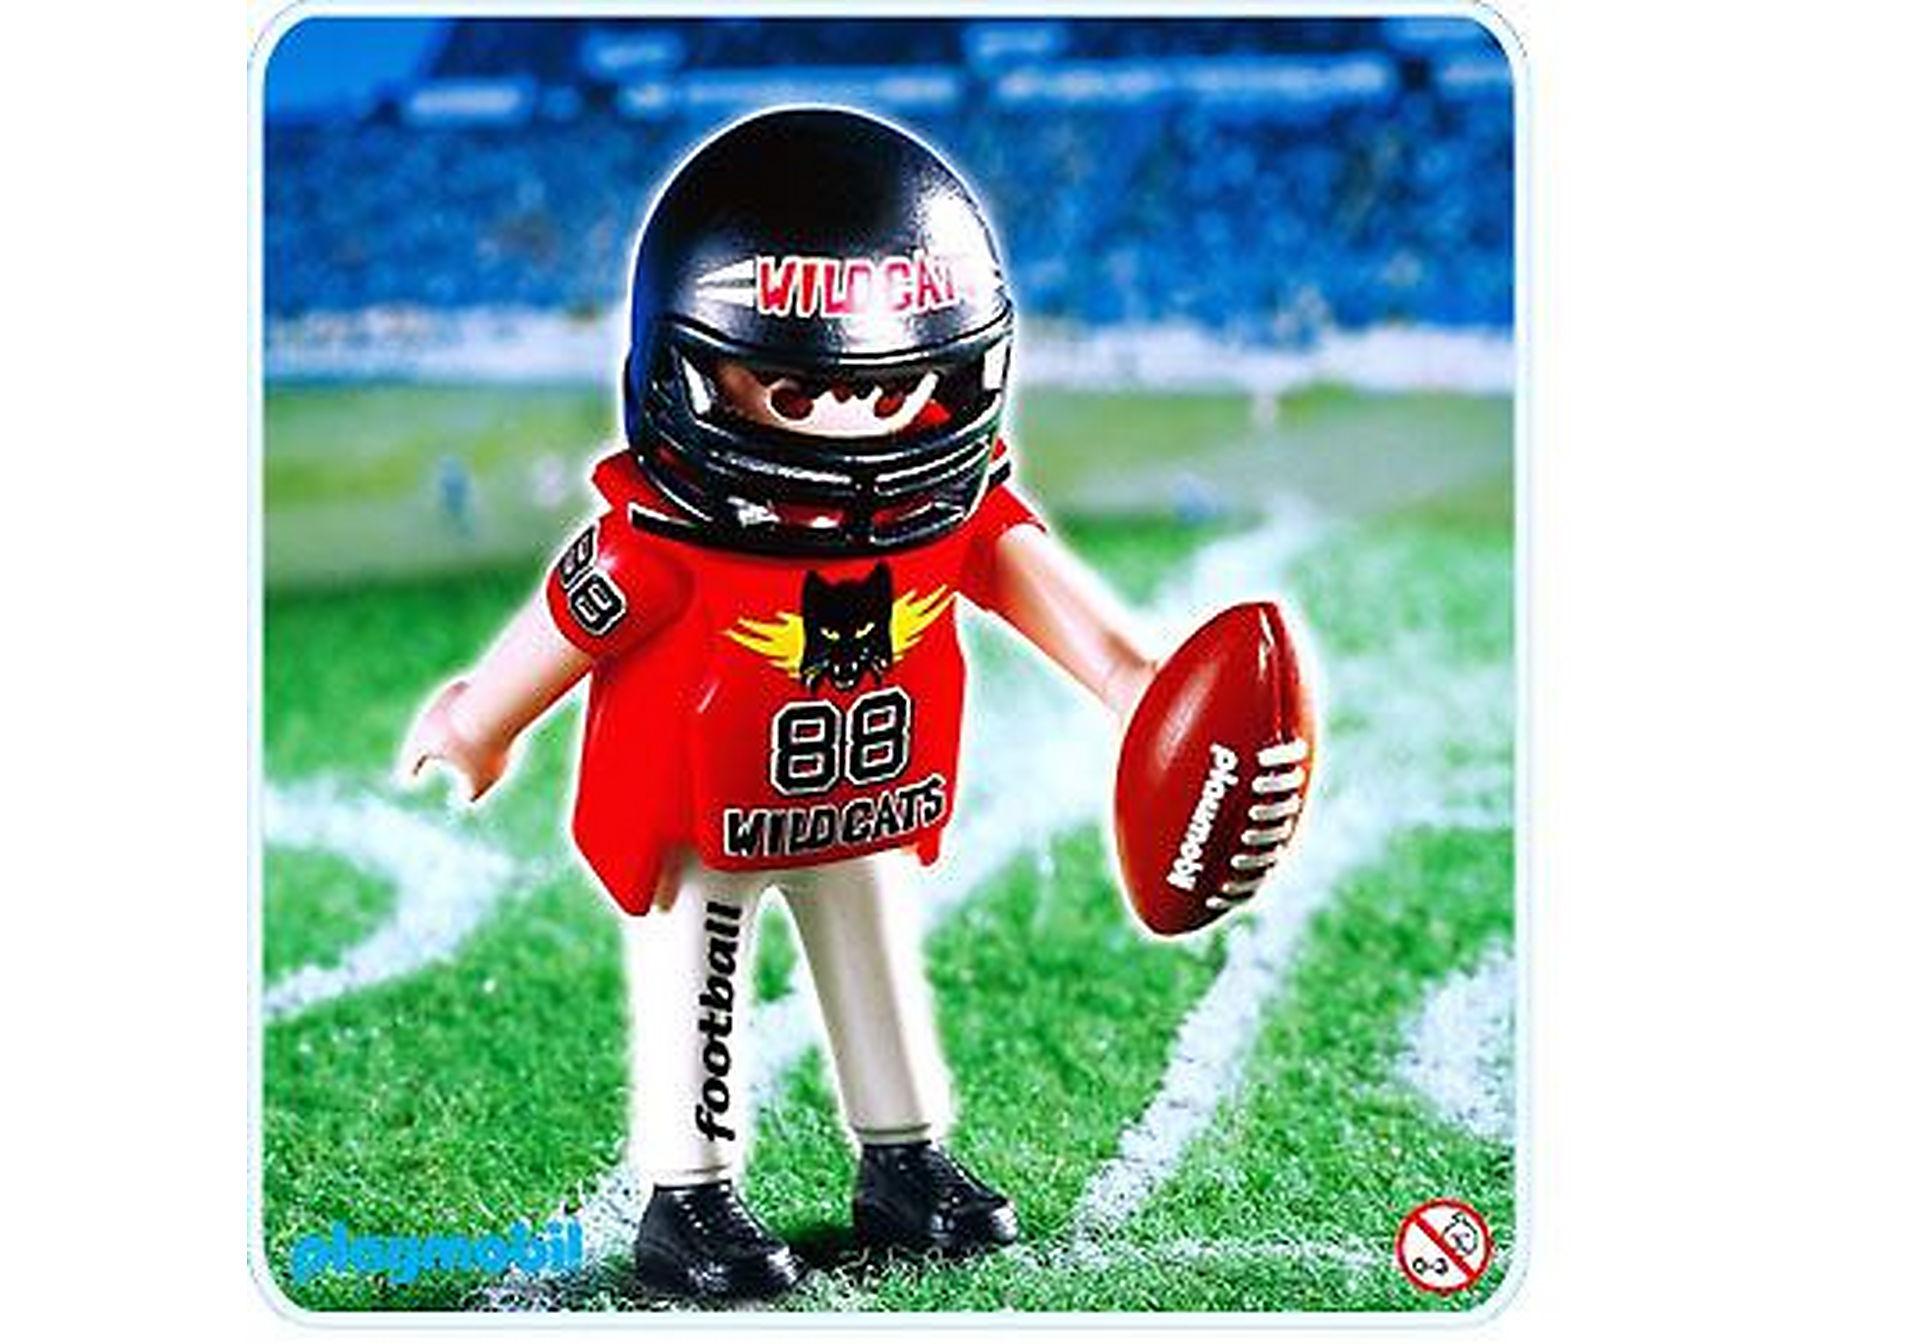 4635-A Footballeur américain zoom image1